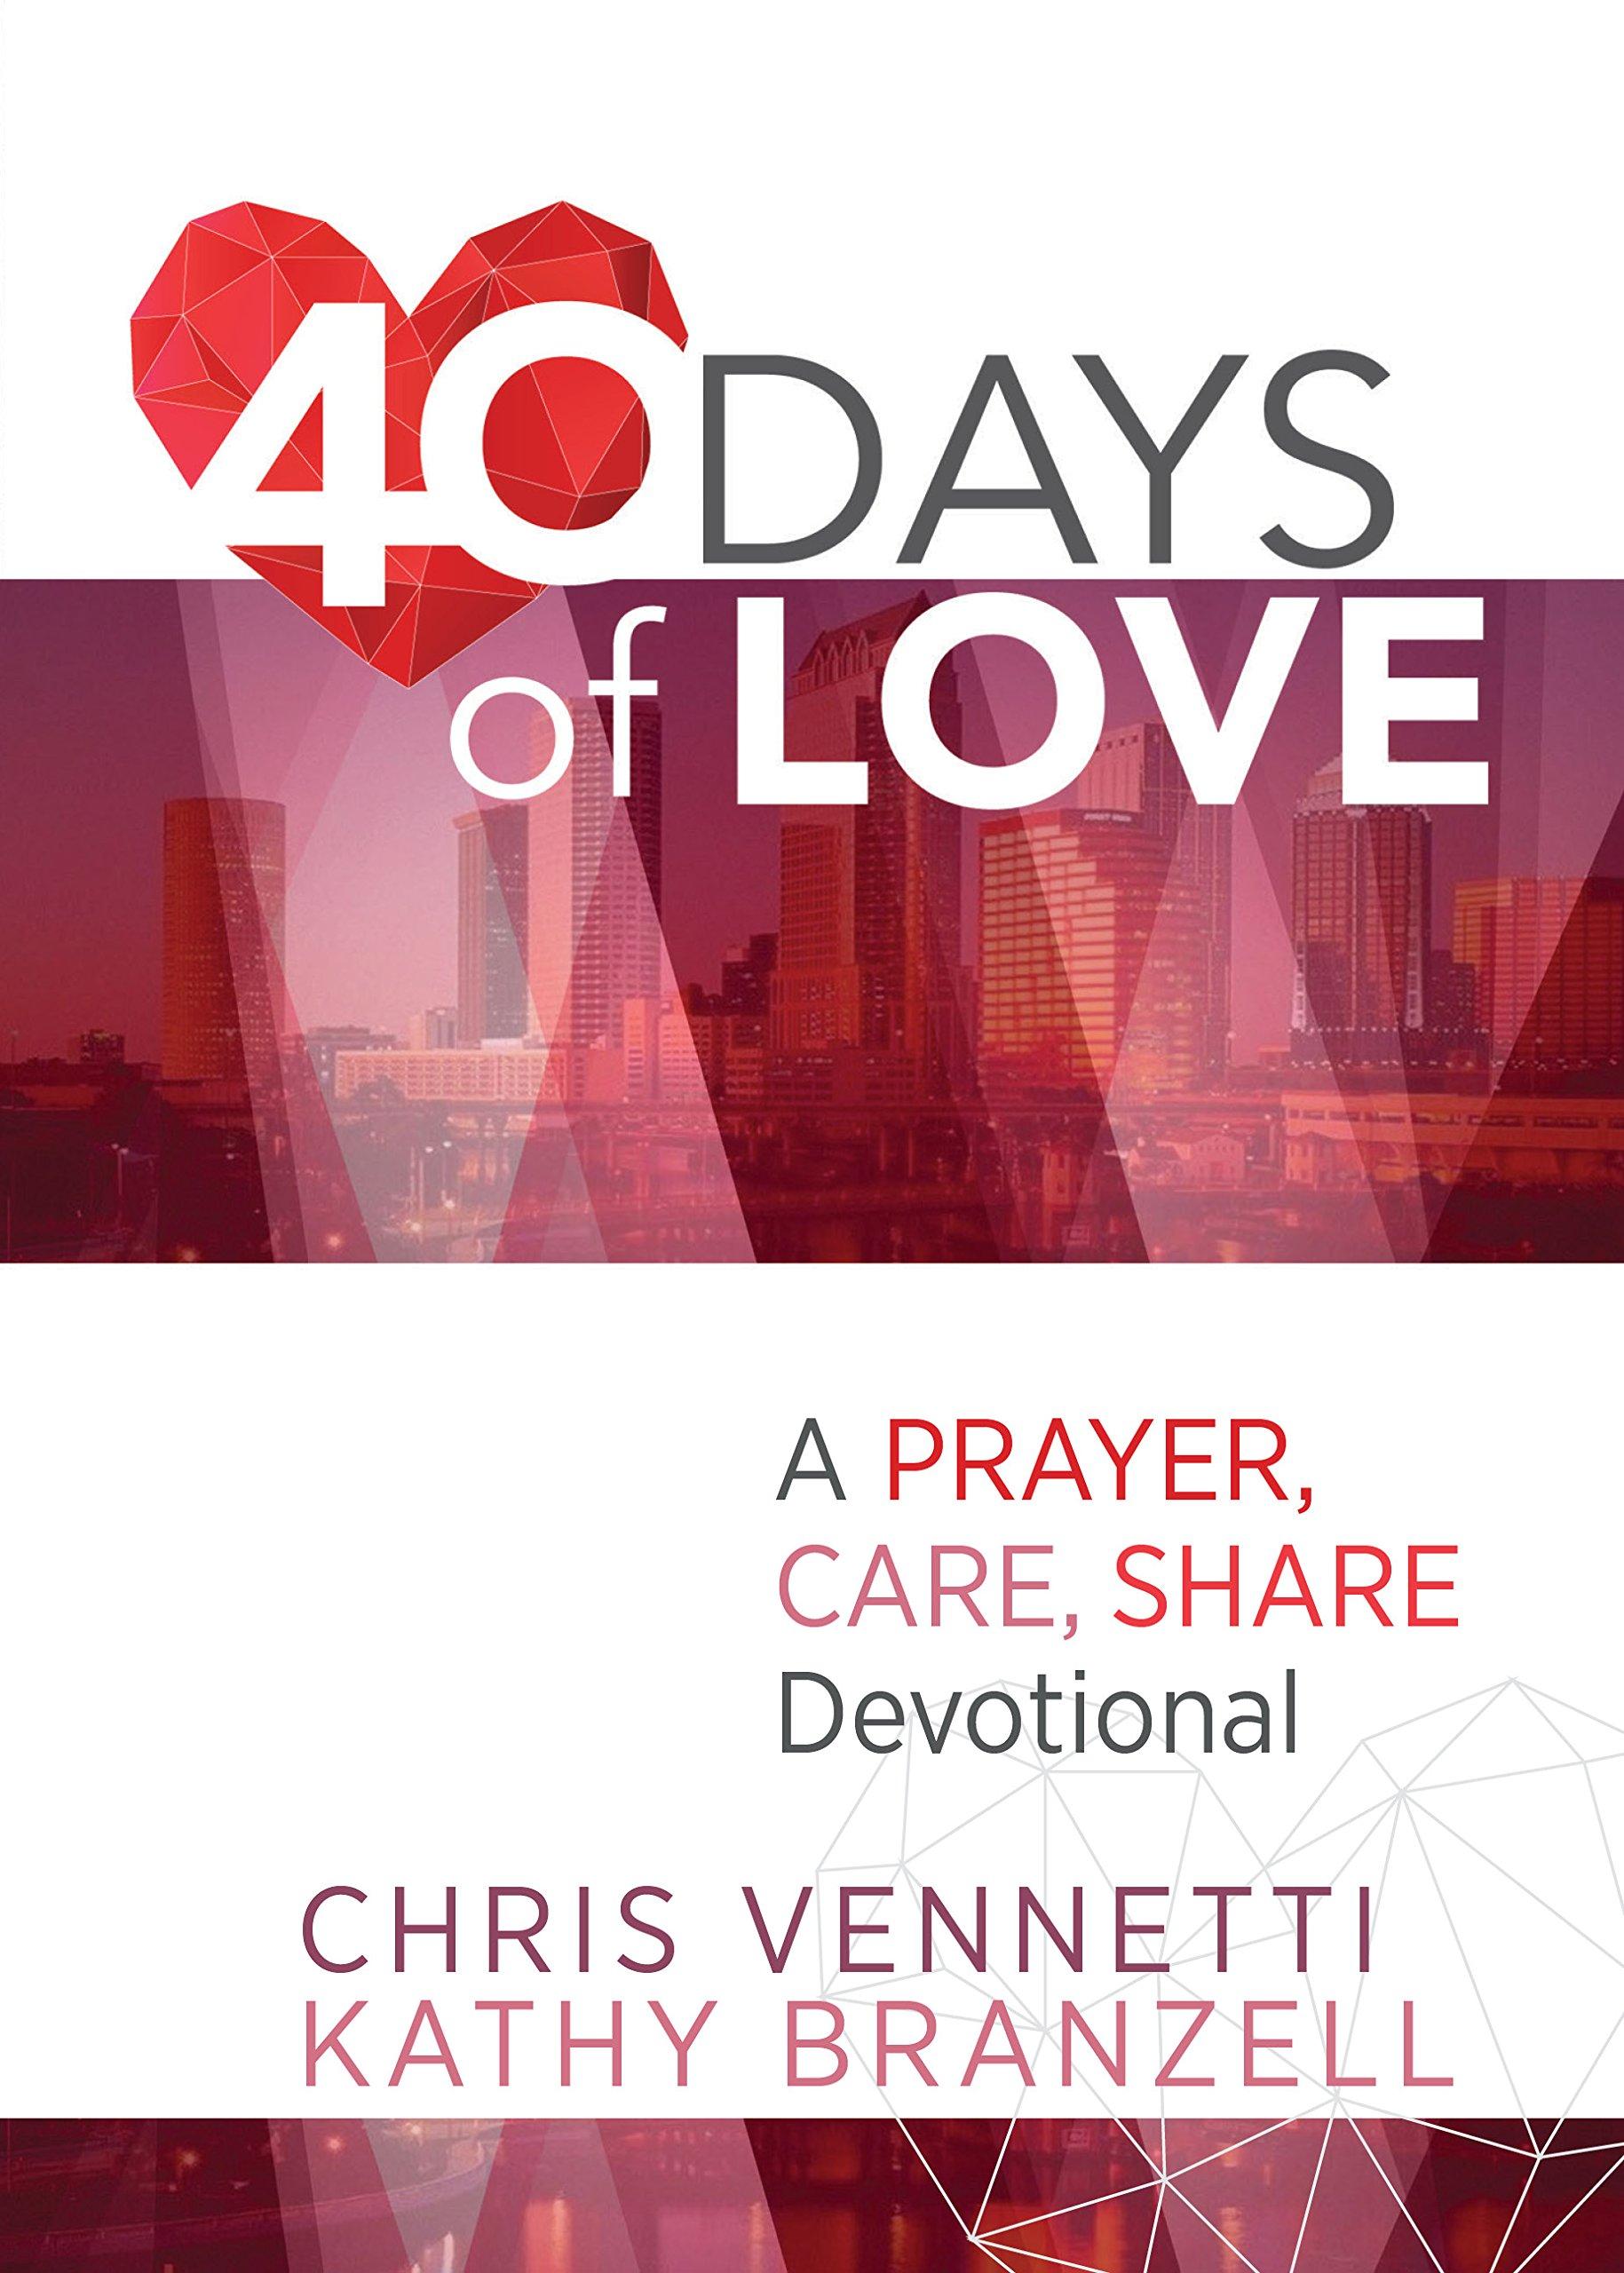 40 Days of Love: A Prayer, Care, Share Devotional: Chris Vennetti ...